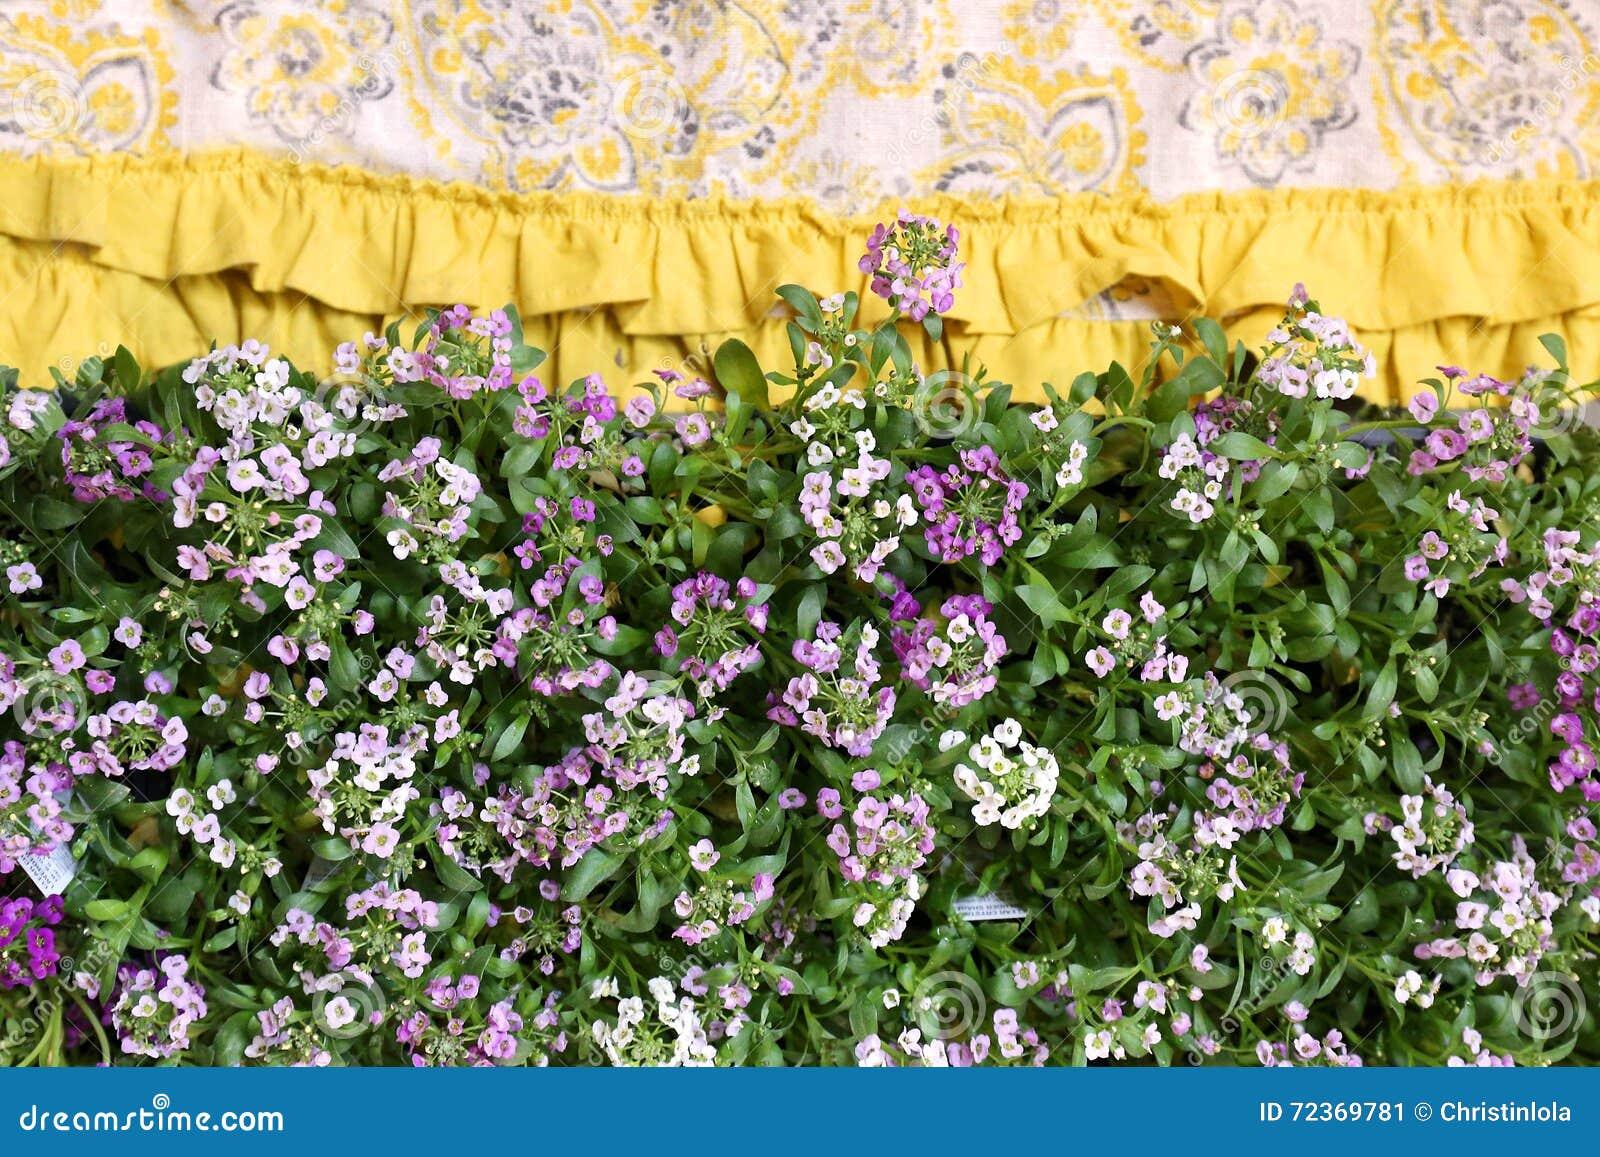 Purple Sweet Alyssum Flowers Border Stock Image Image Of Fabric